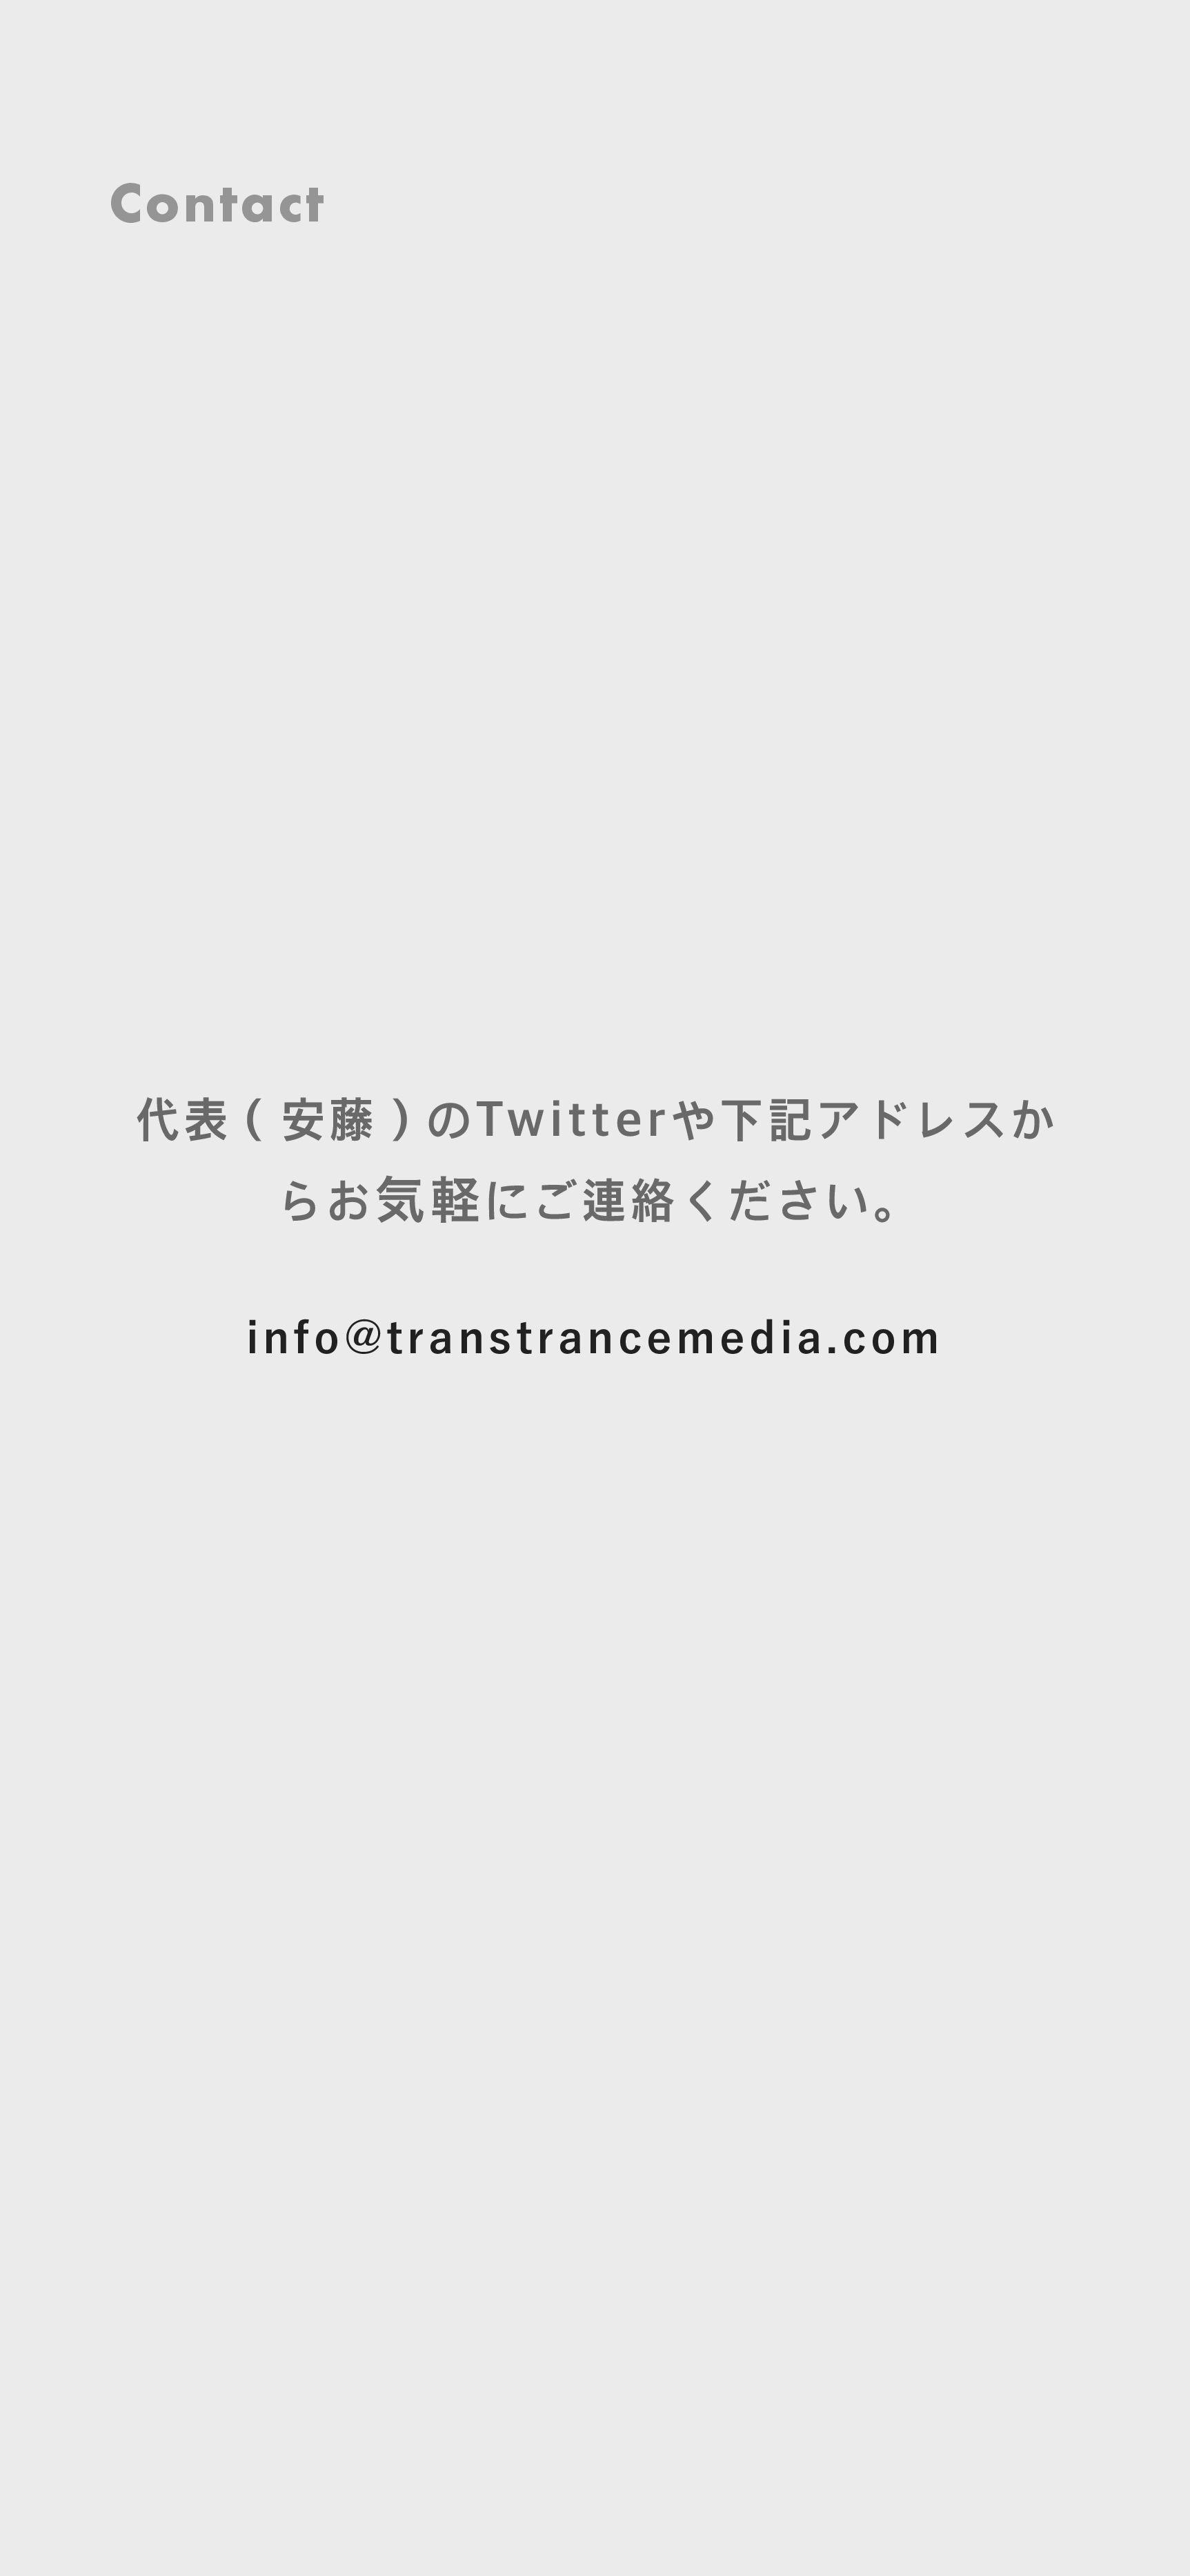 Contact ͓͍߹Θͤ